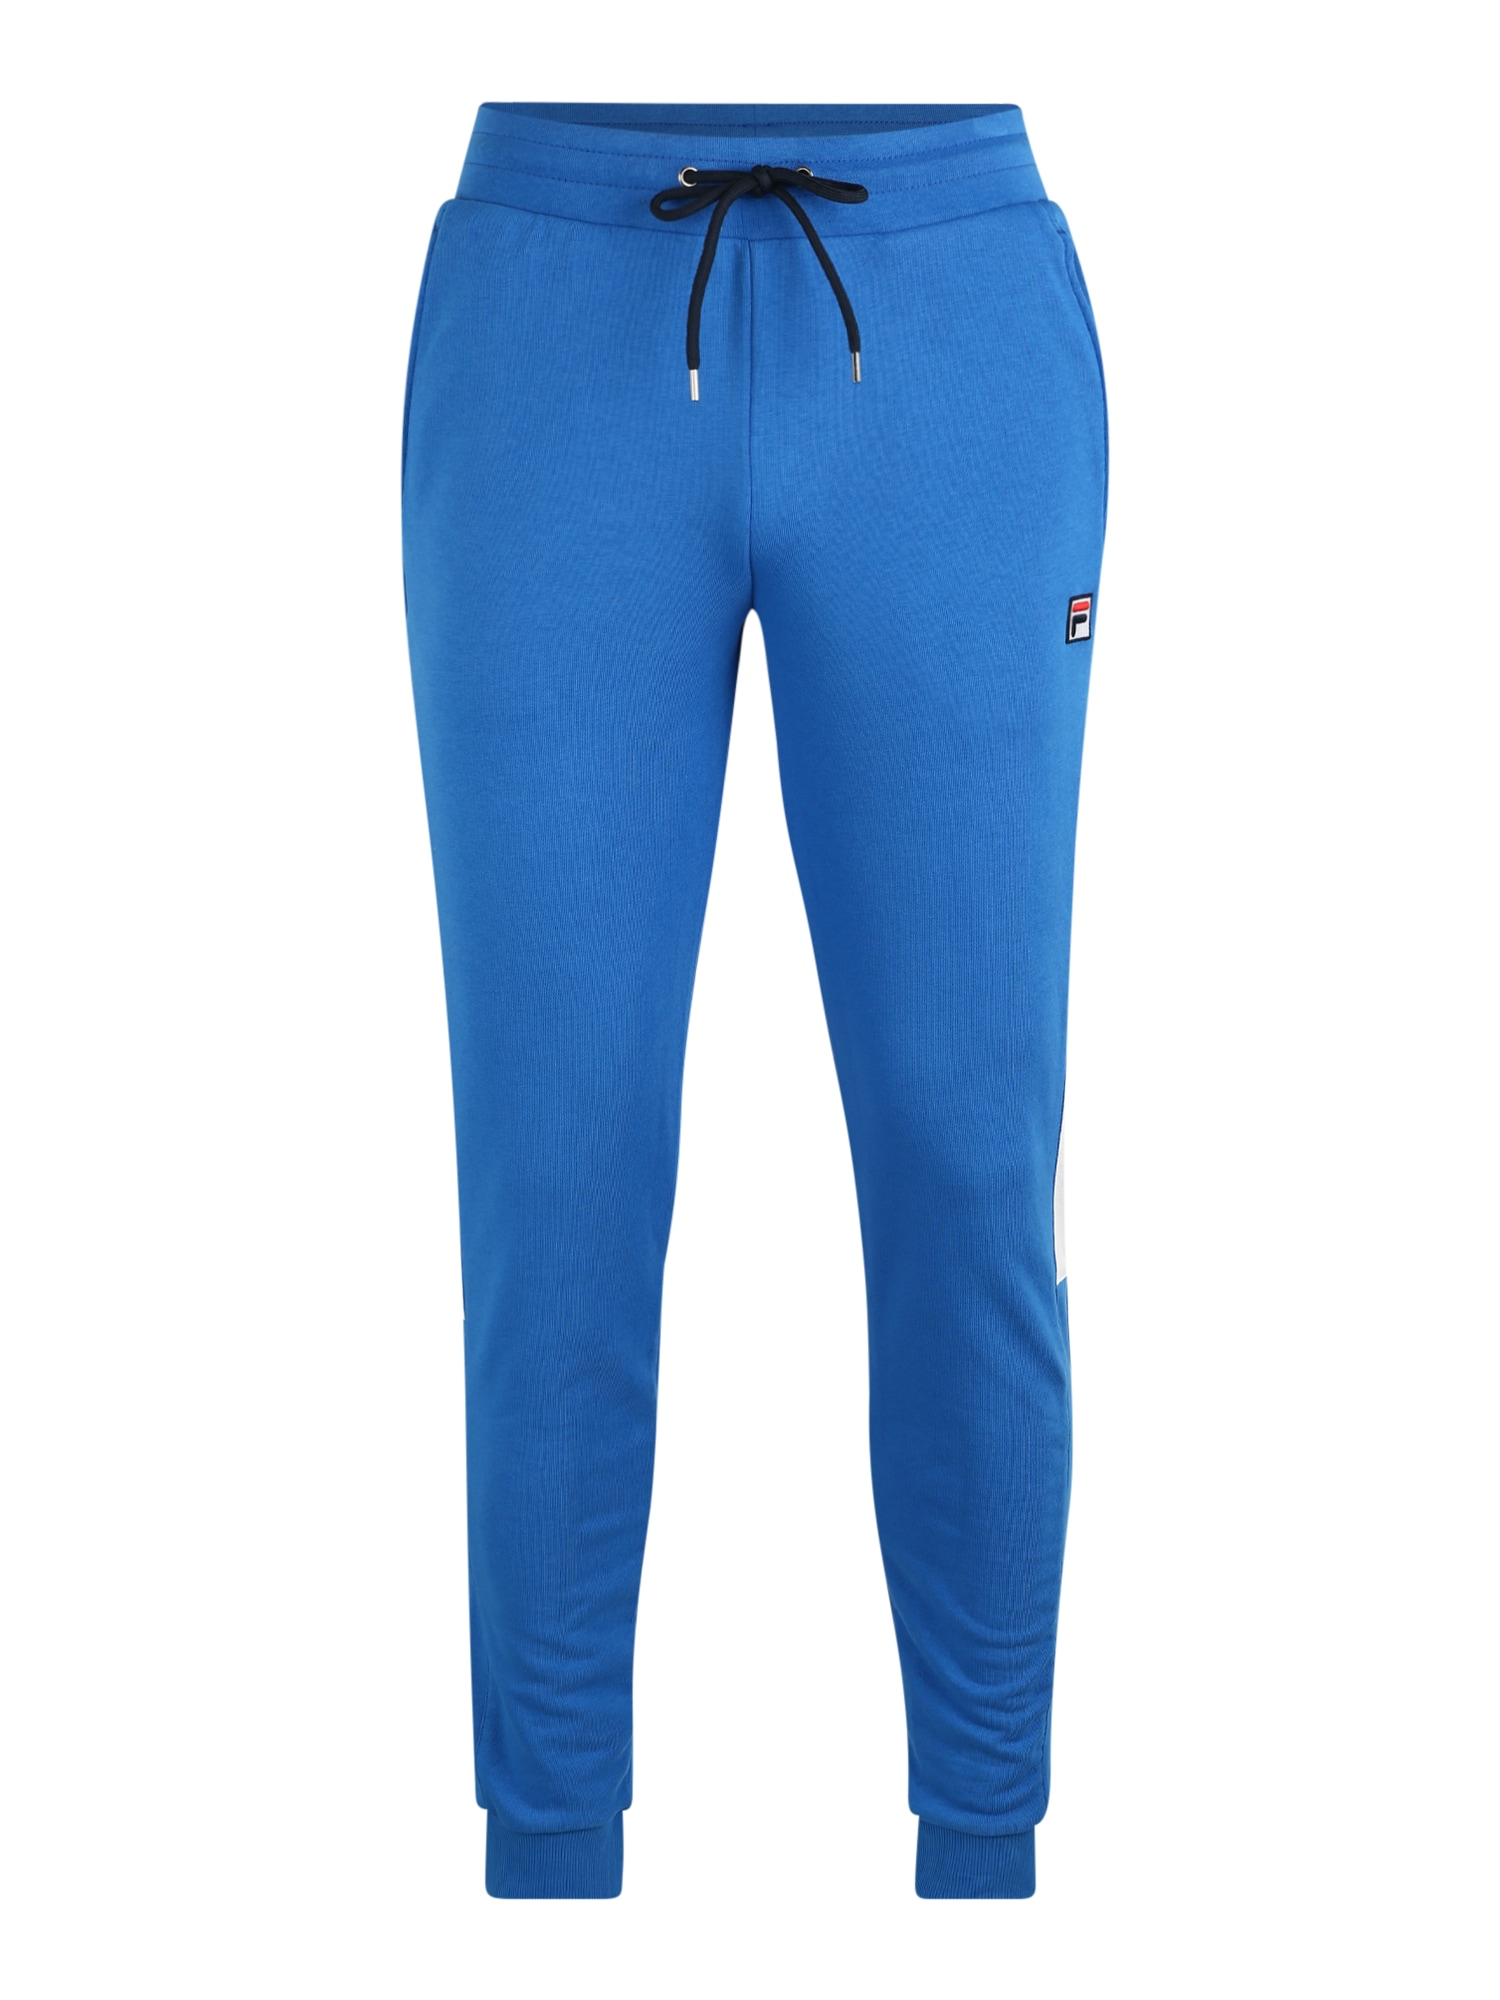 FILA Sportinės kelnės 'Freddie' balta / mėlyna